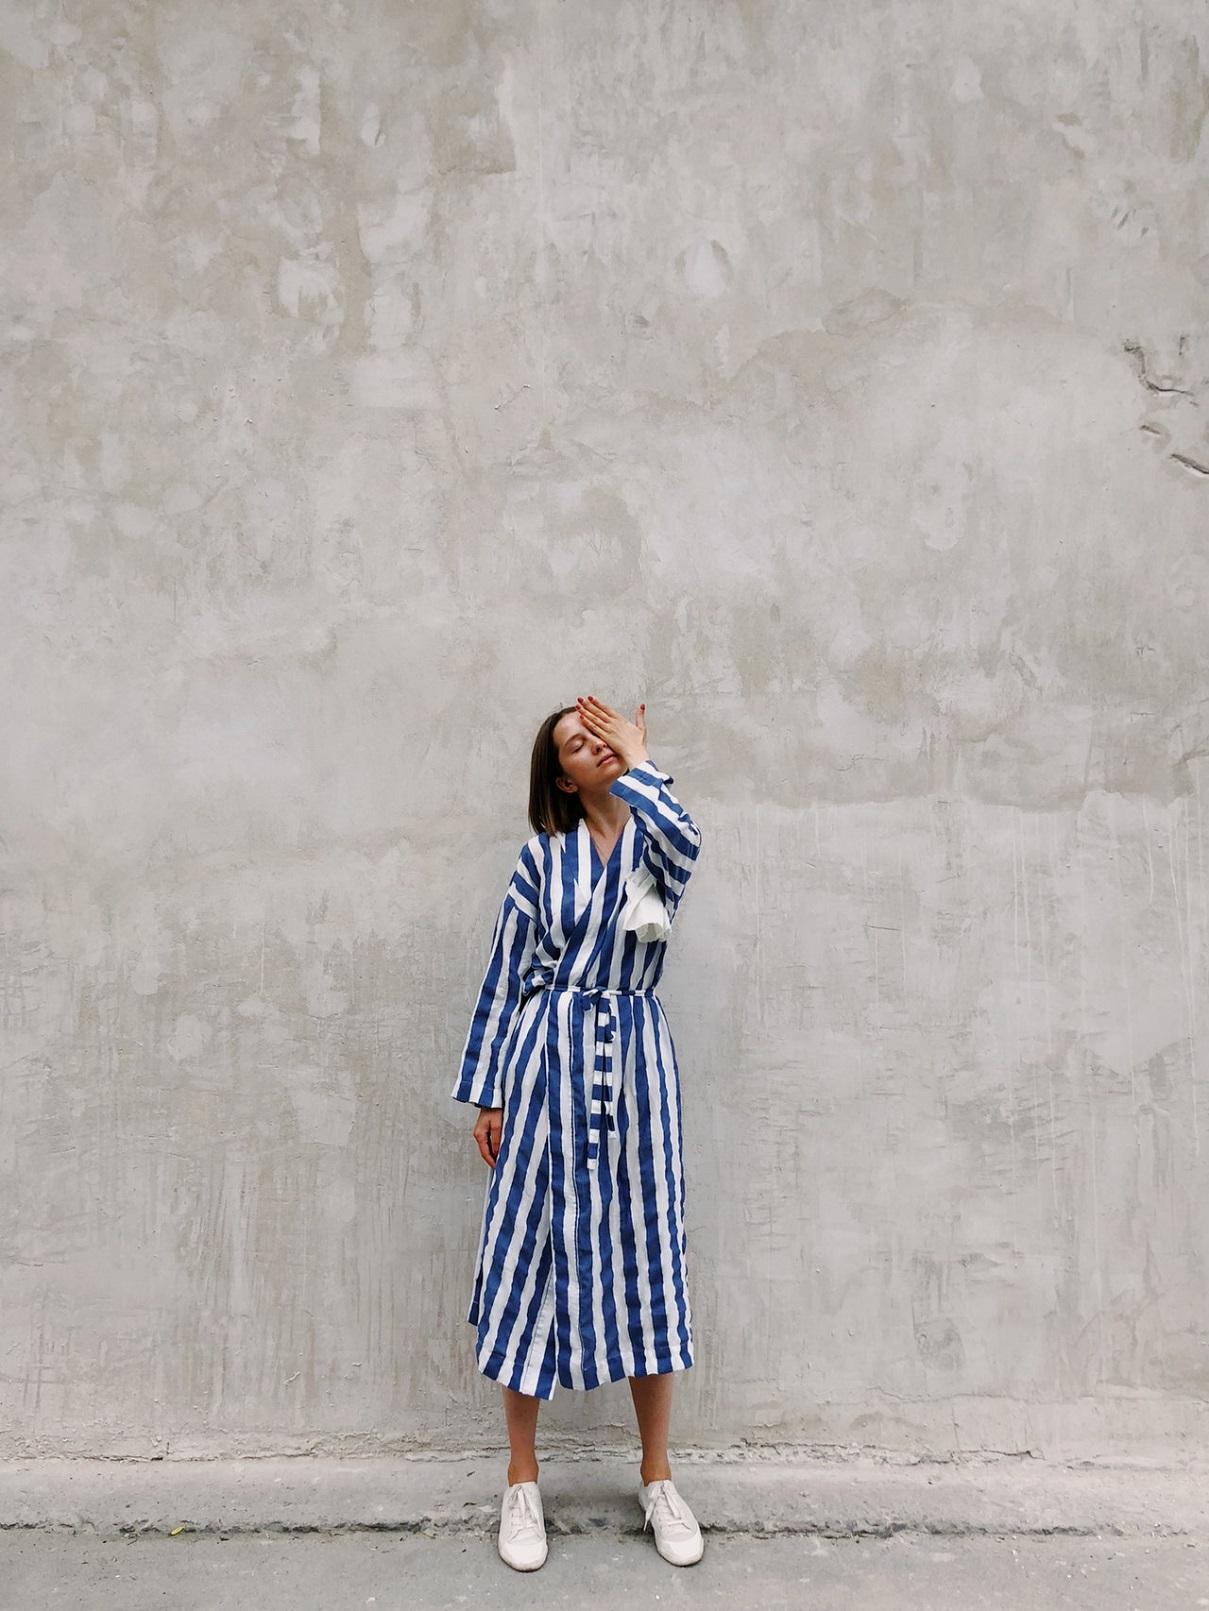 rochia tip camasa albastra cu dungi albe